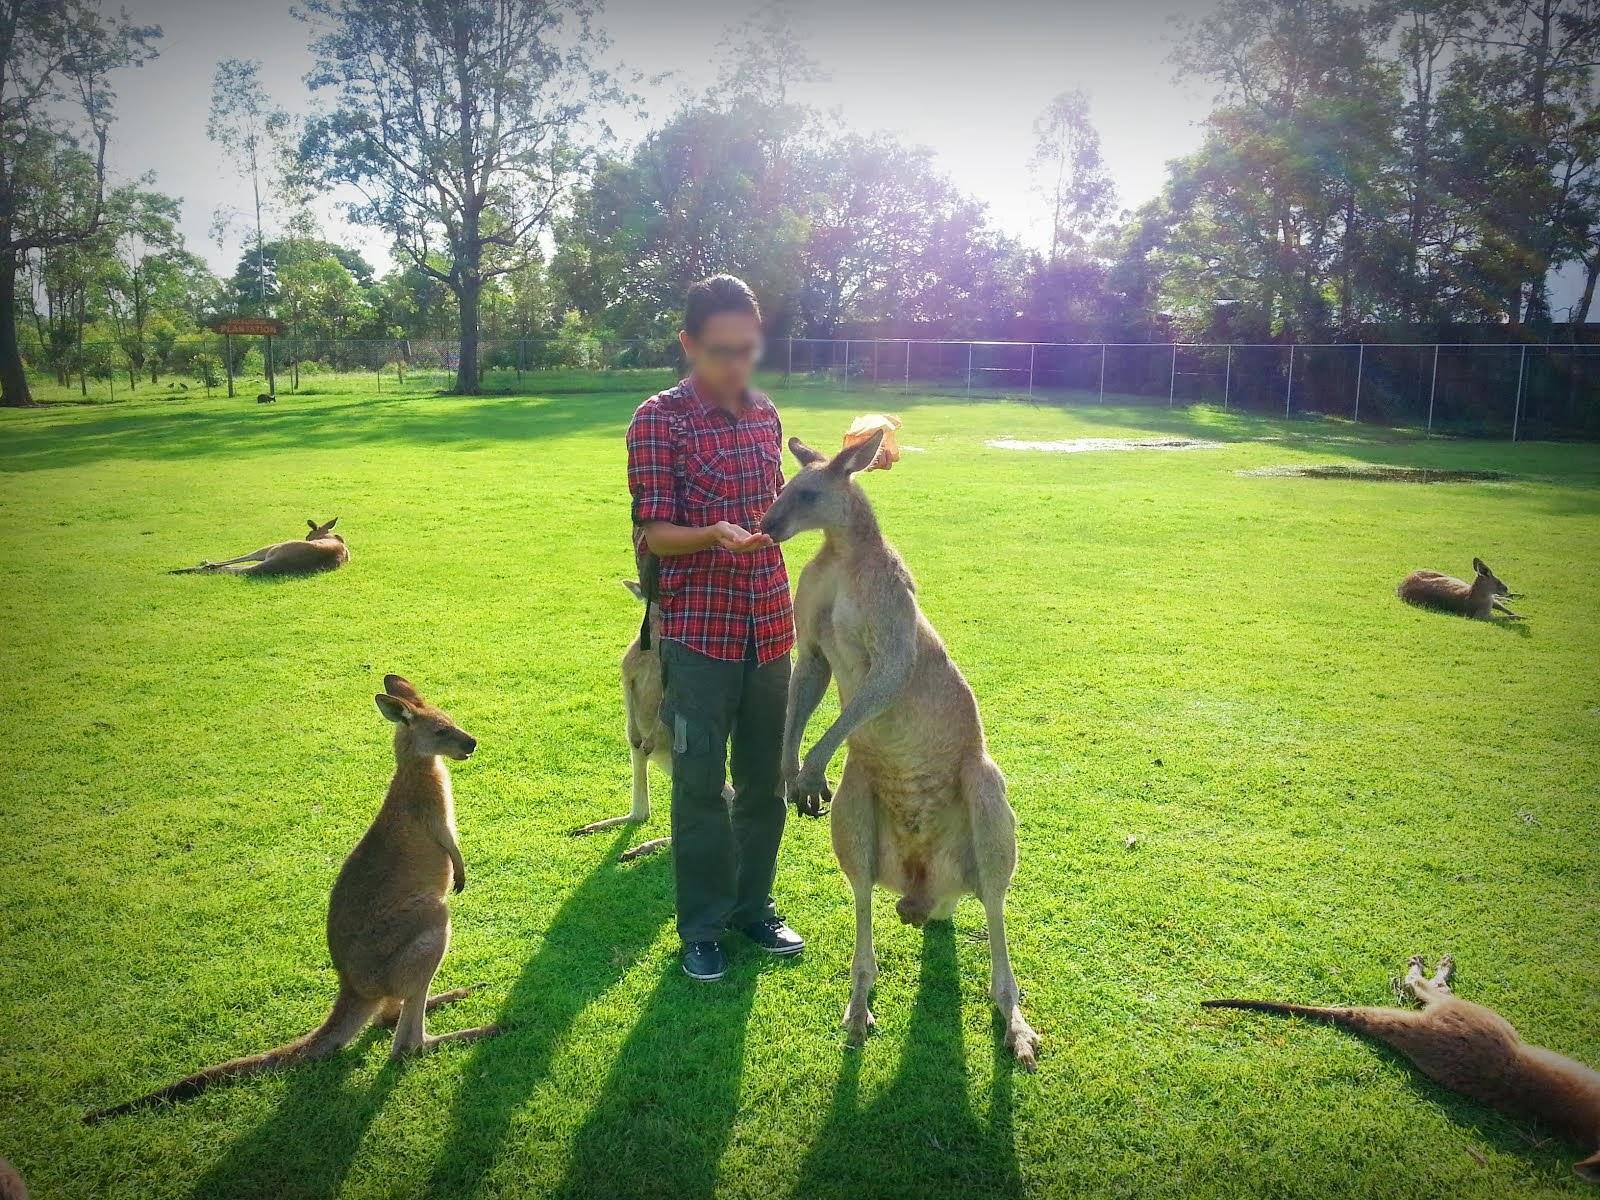 Lone Pine Koala Sanctuary, Brisbane Australia